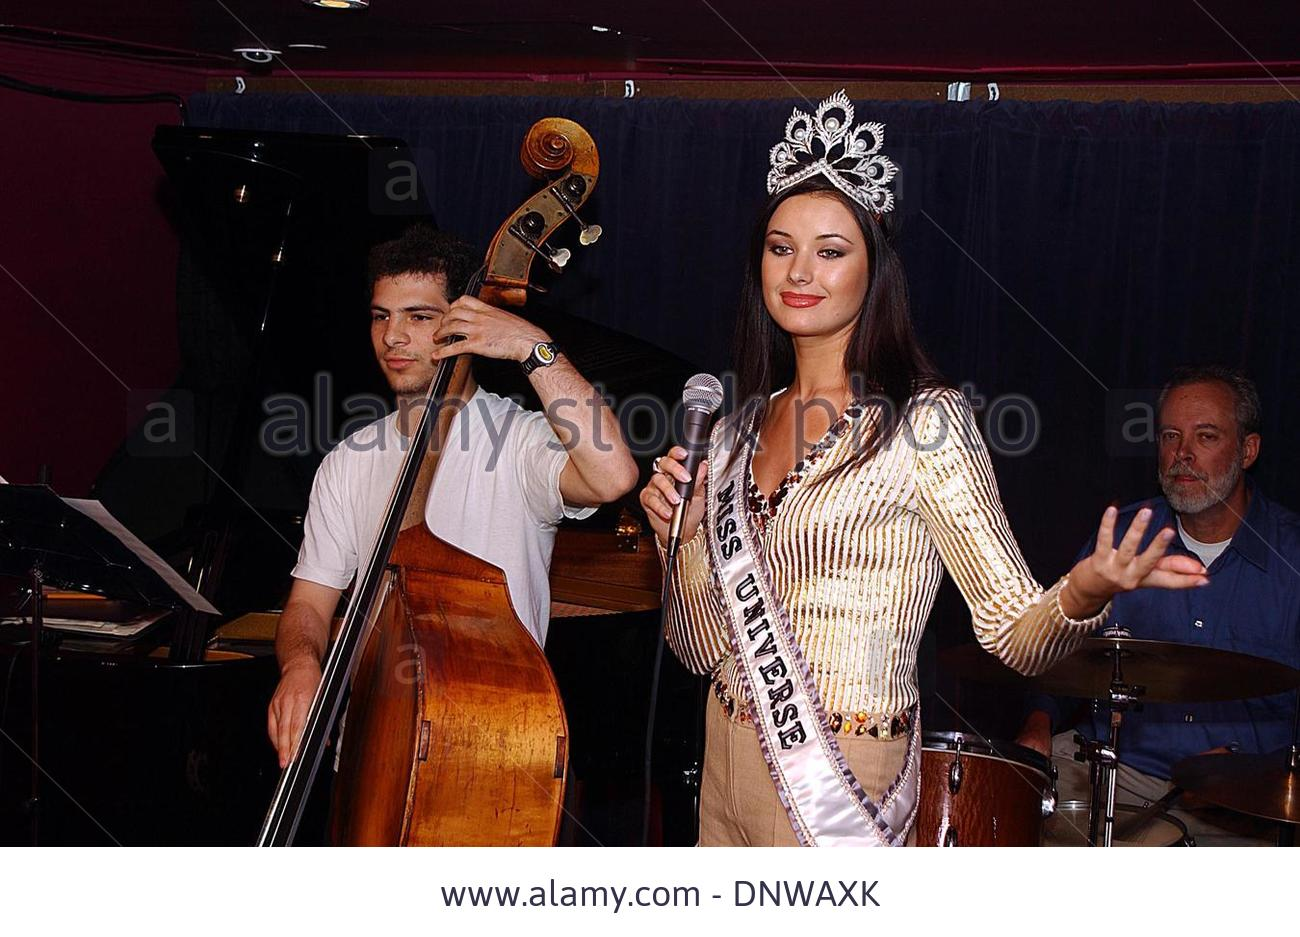 oxana fedorova, miss universe 2002 (renuncio). - Página 4 Dz2tboeh